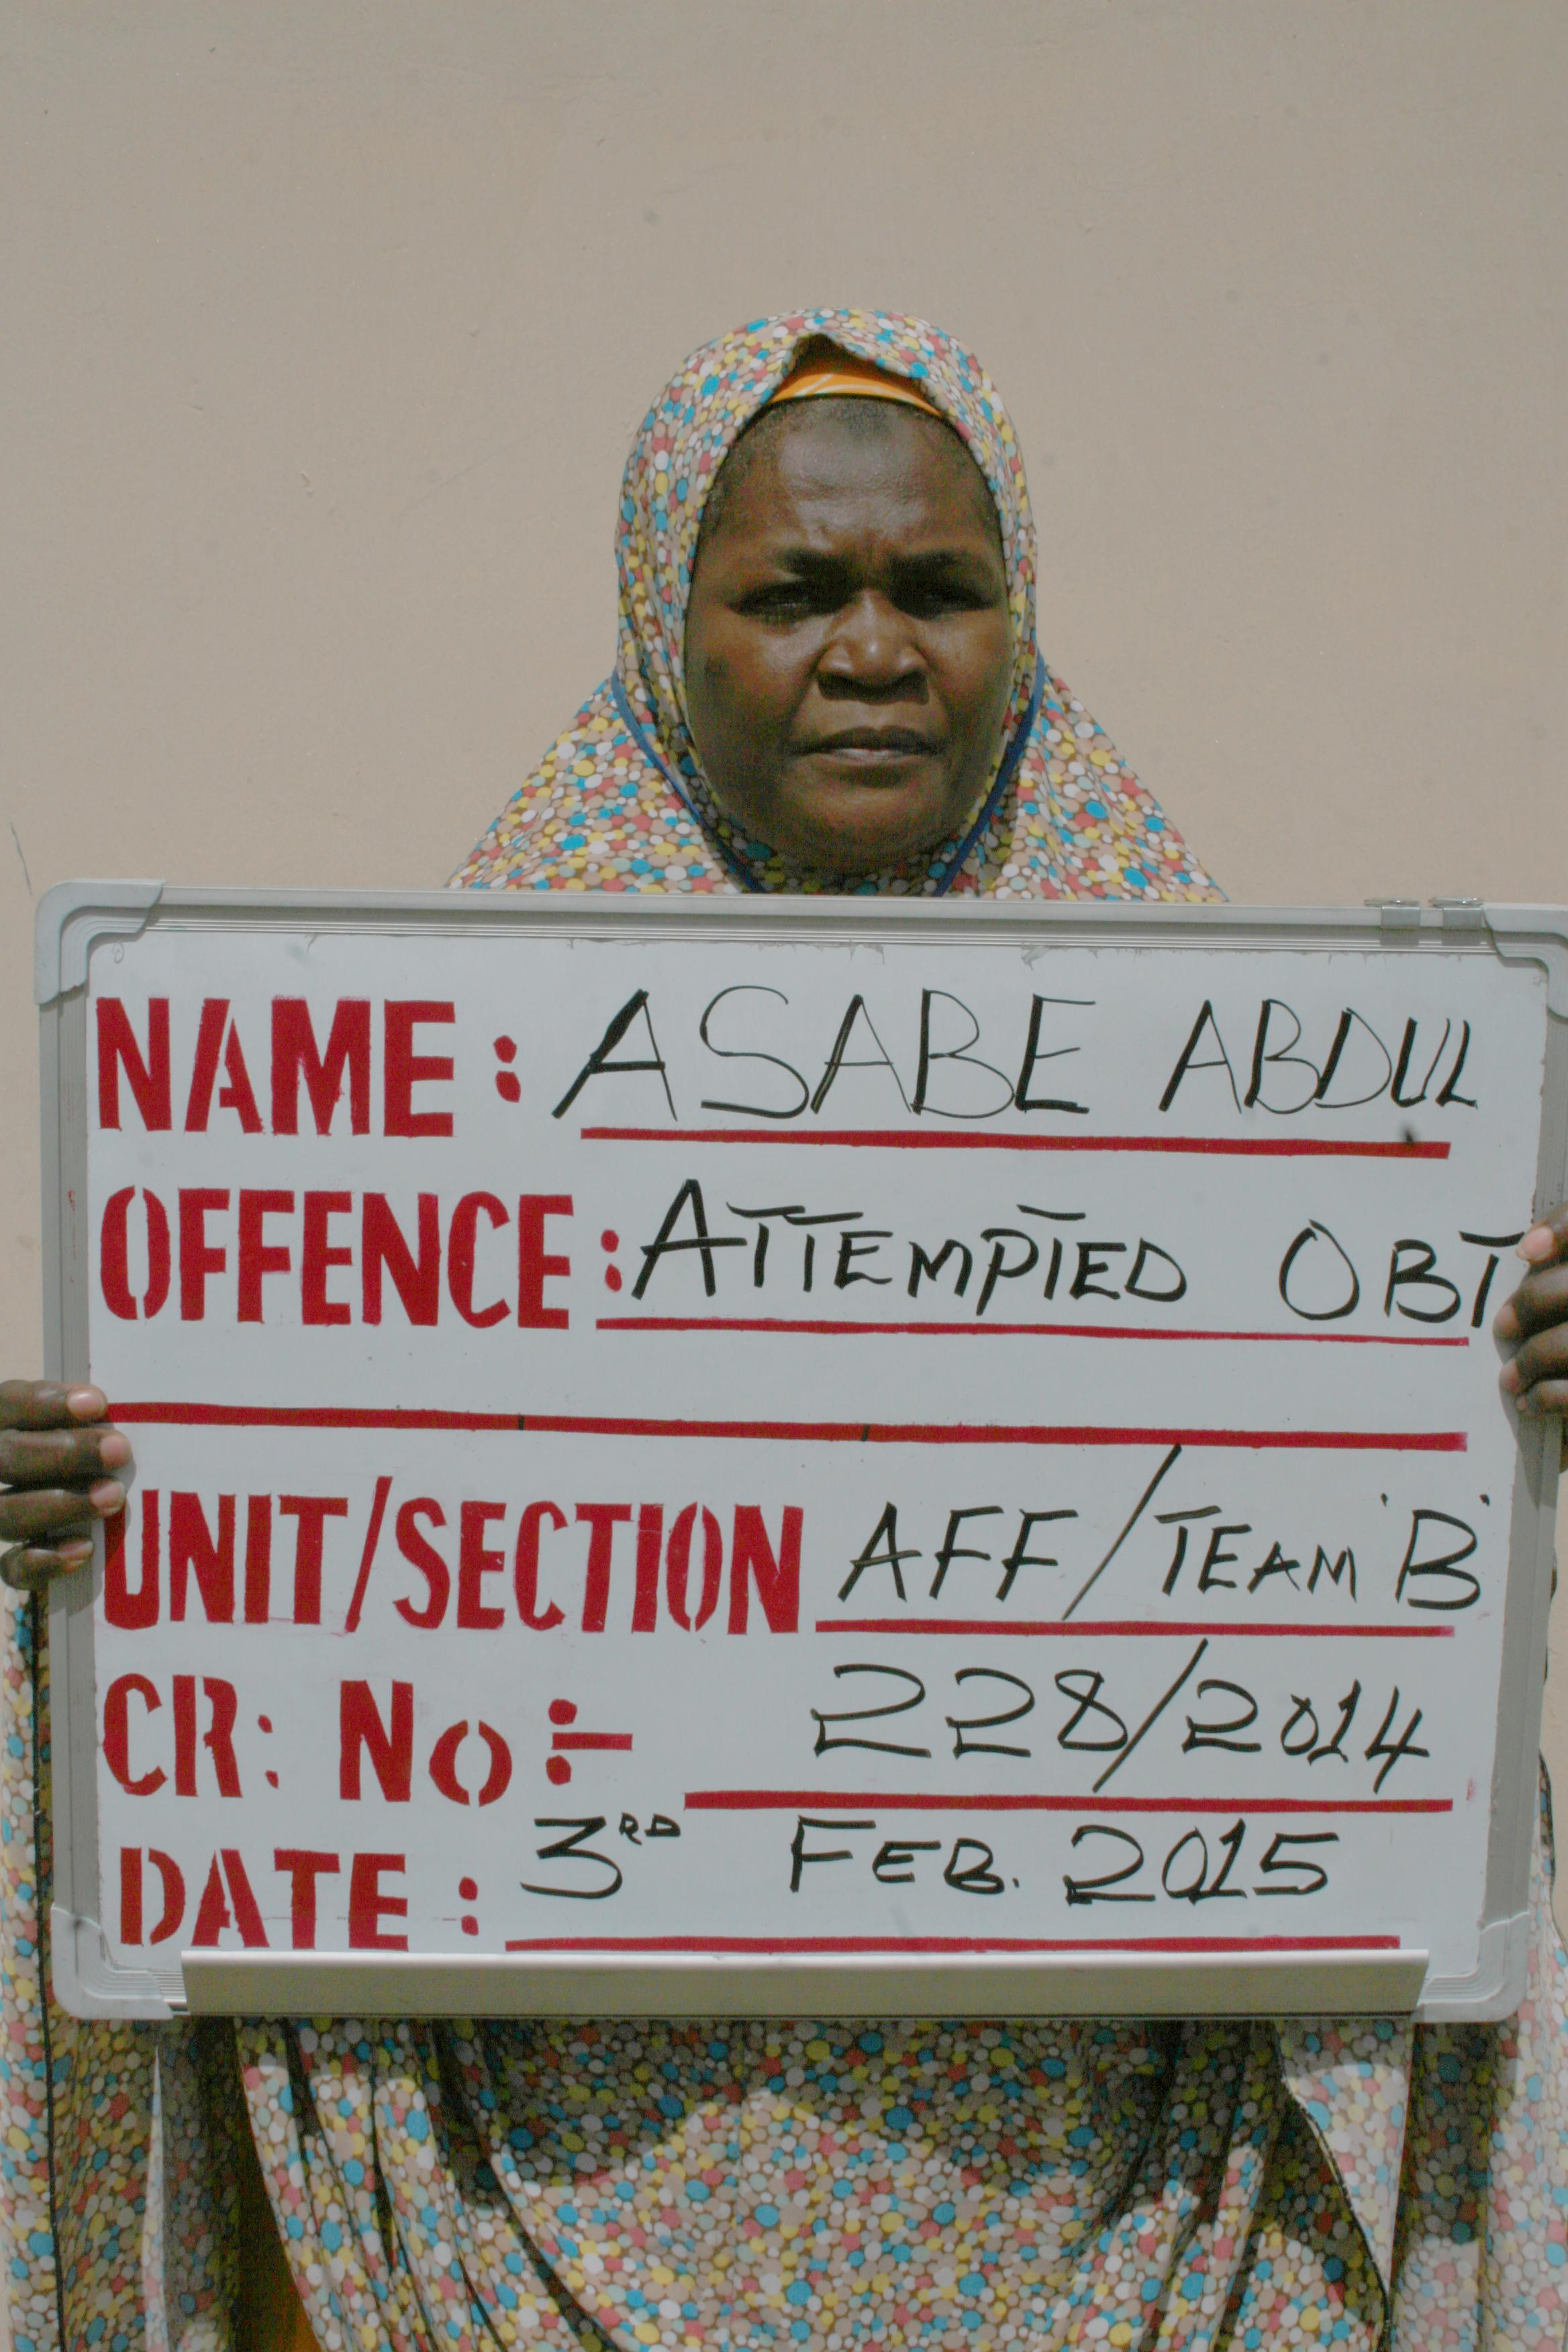 Asabe Abdul